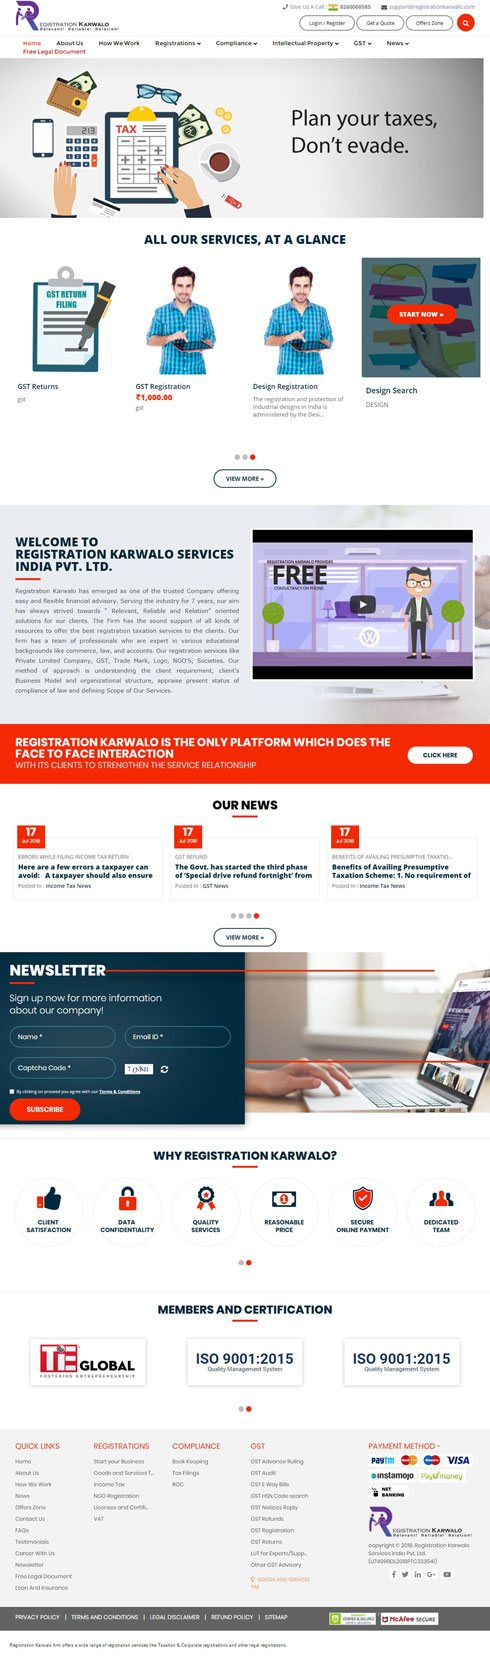 Registration Karwalo India Web Design